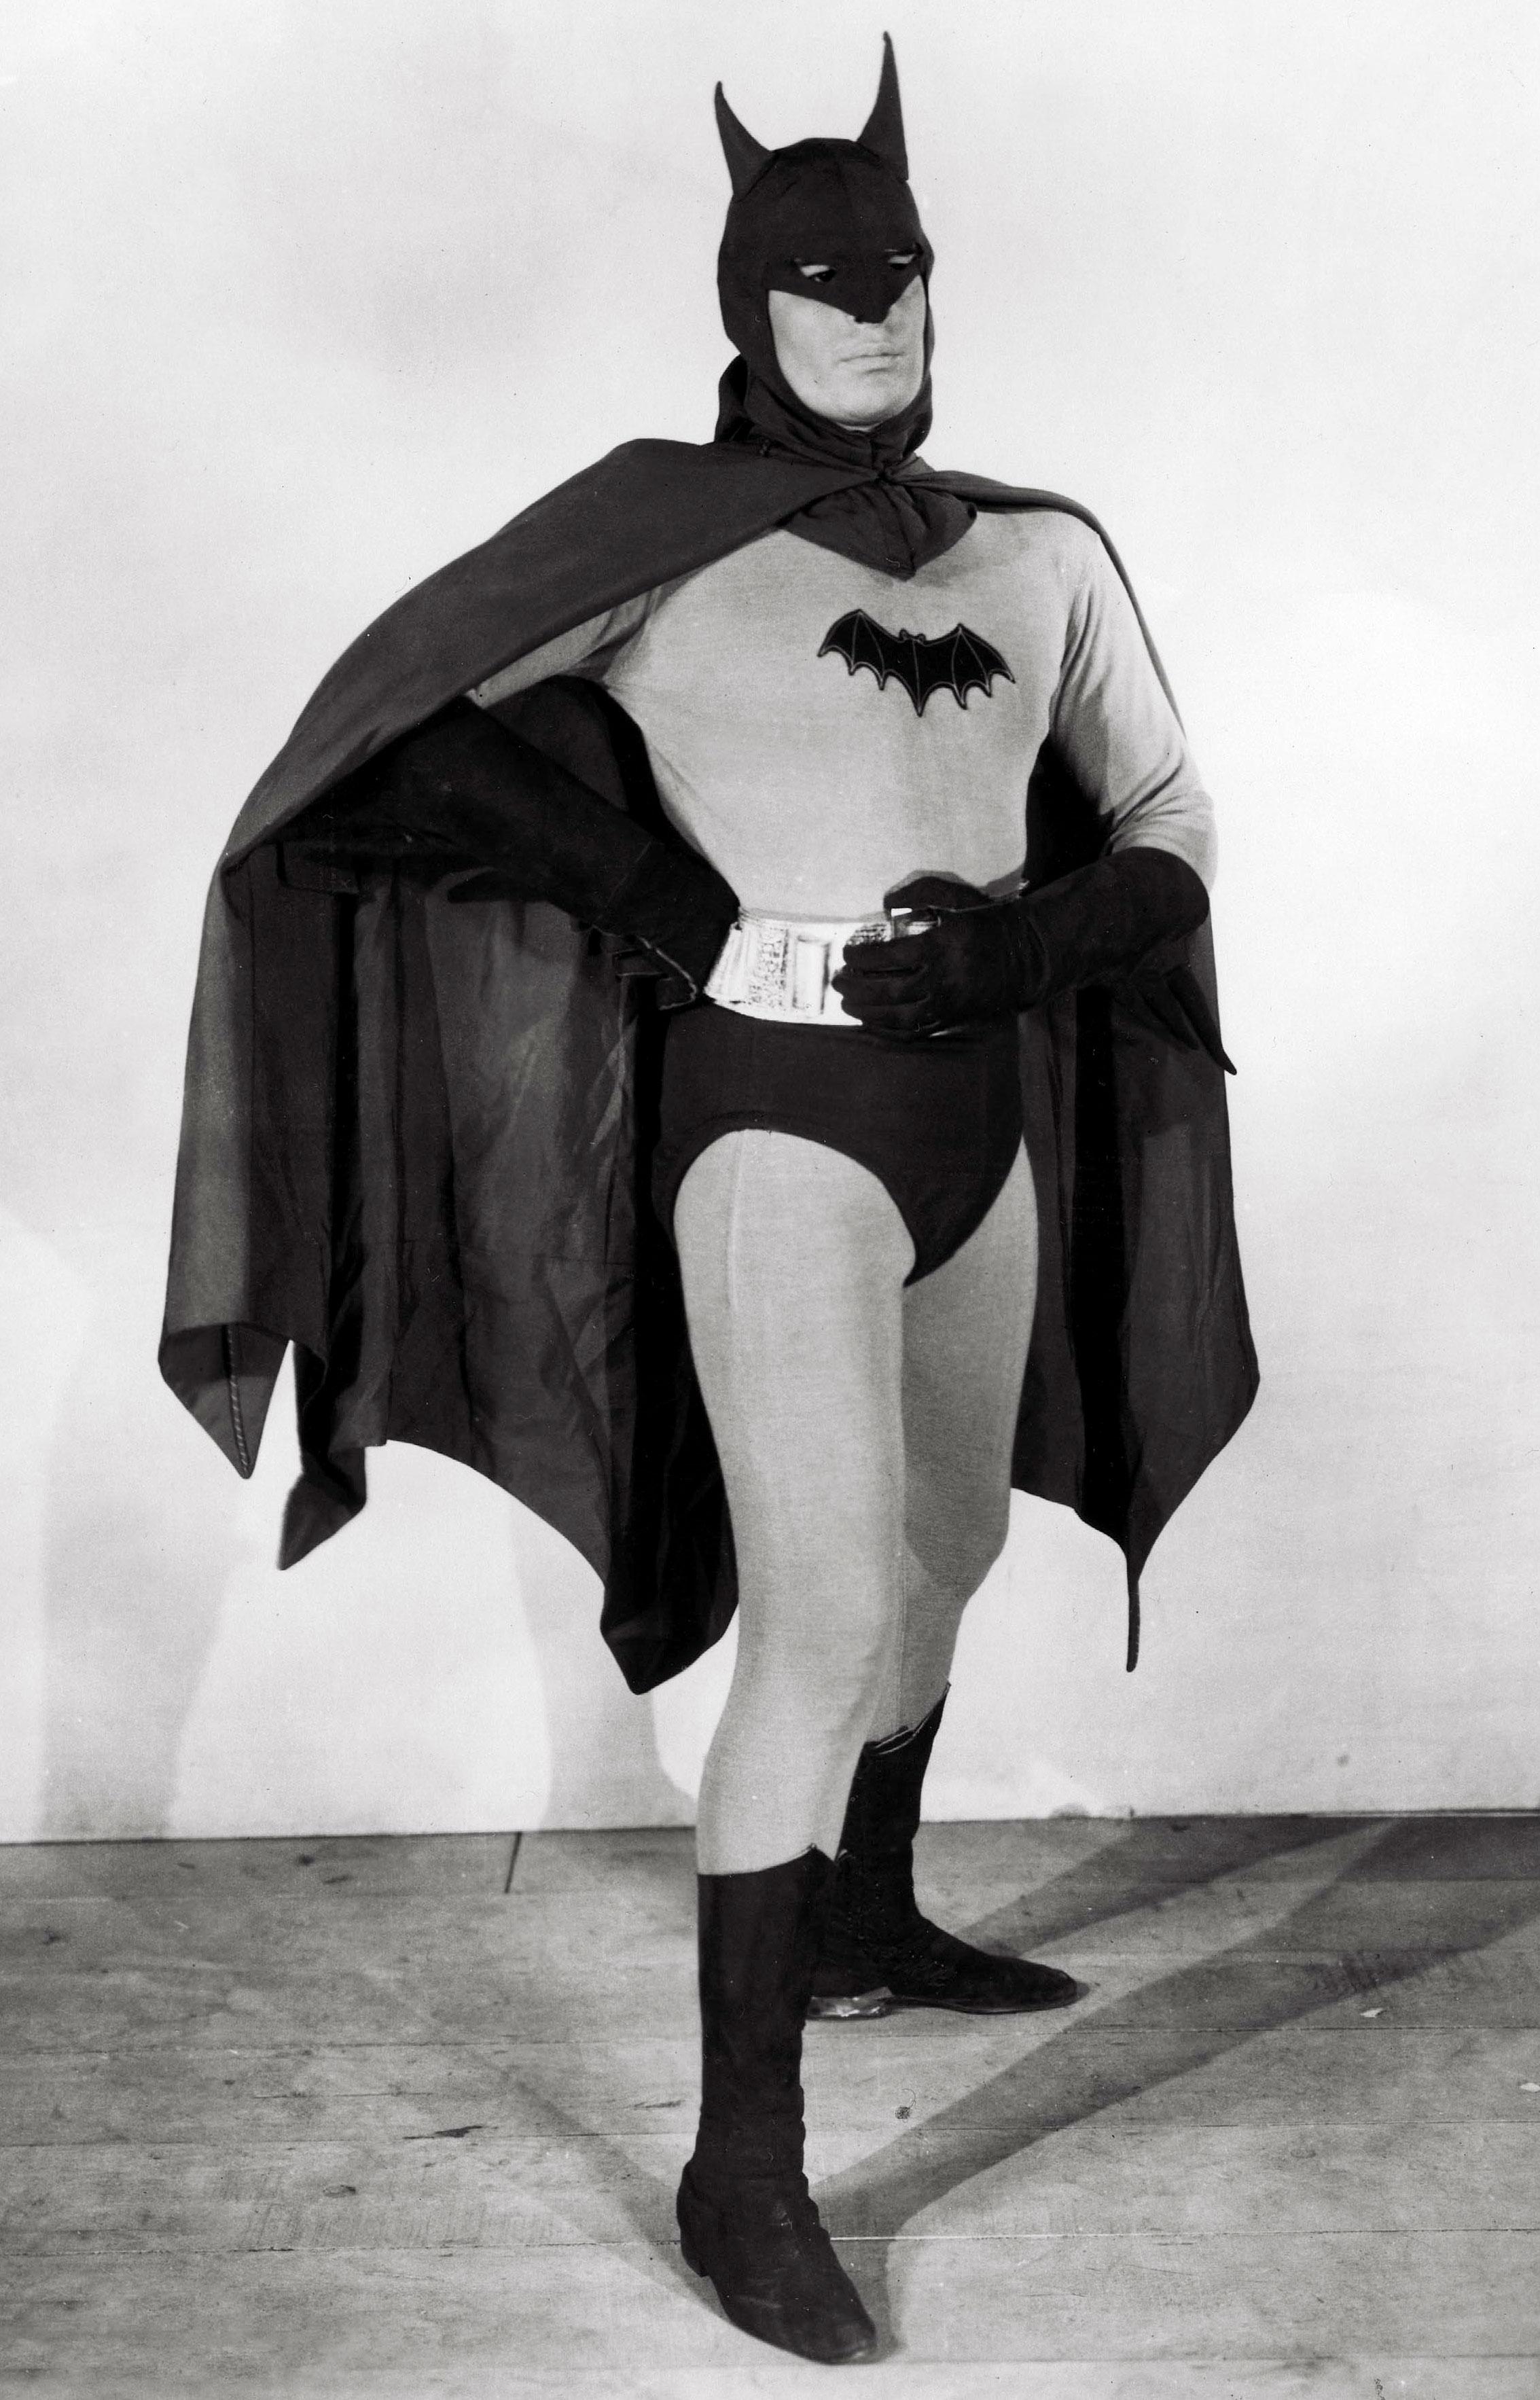 File:Lewis Wilson as Batman, from The Batman (serial,1943).jpg